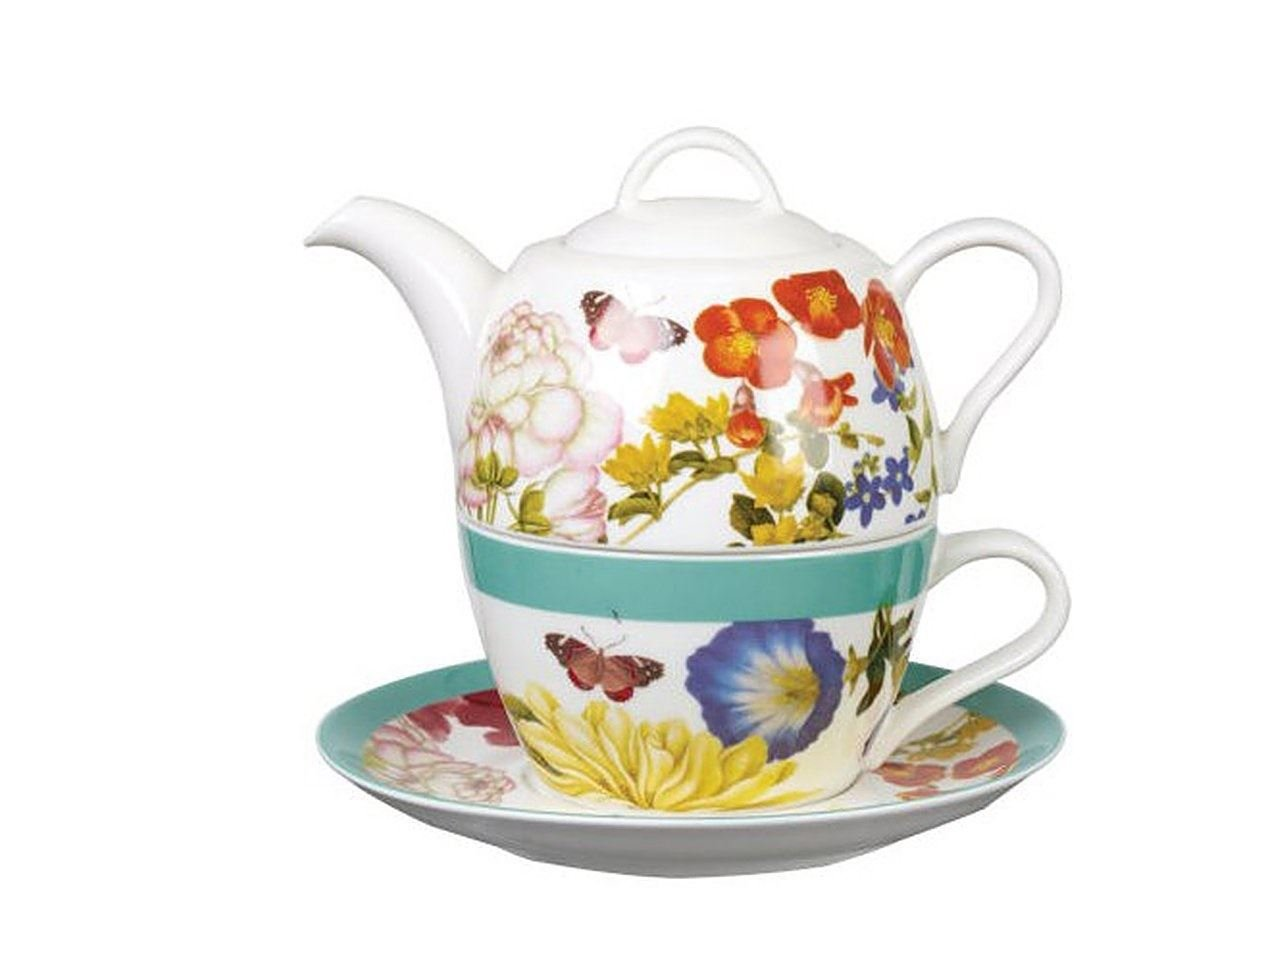 Churchill China RHS Queens Butterflies and Bloom Admiral Tea Pot Tea for One Set 11.49 fl oz